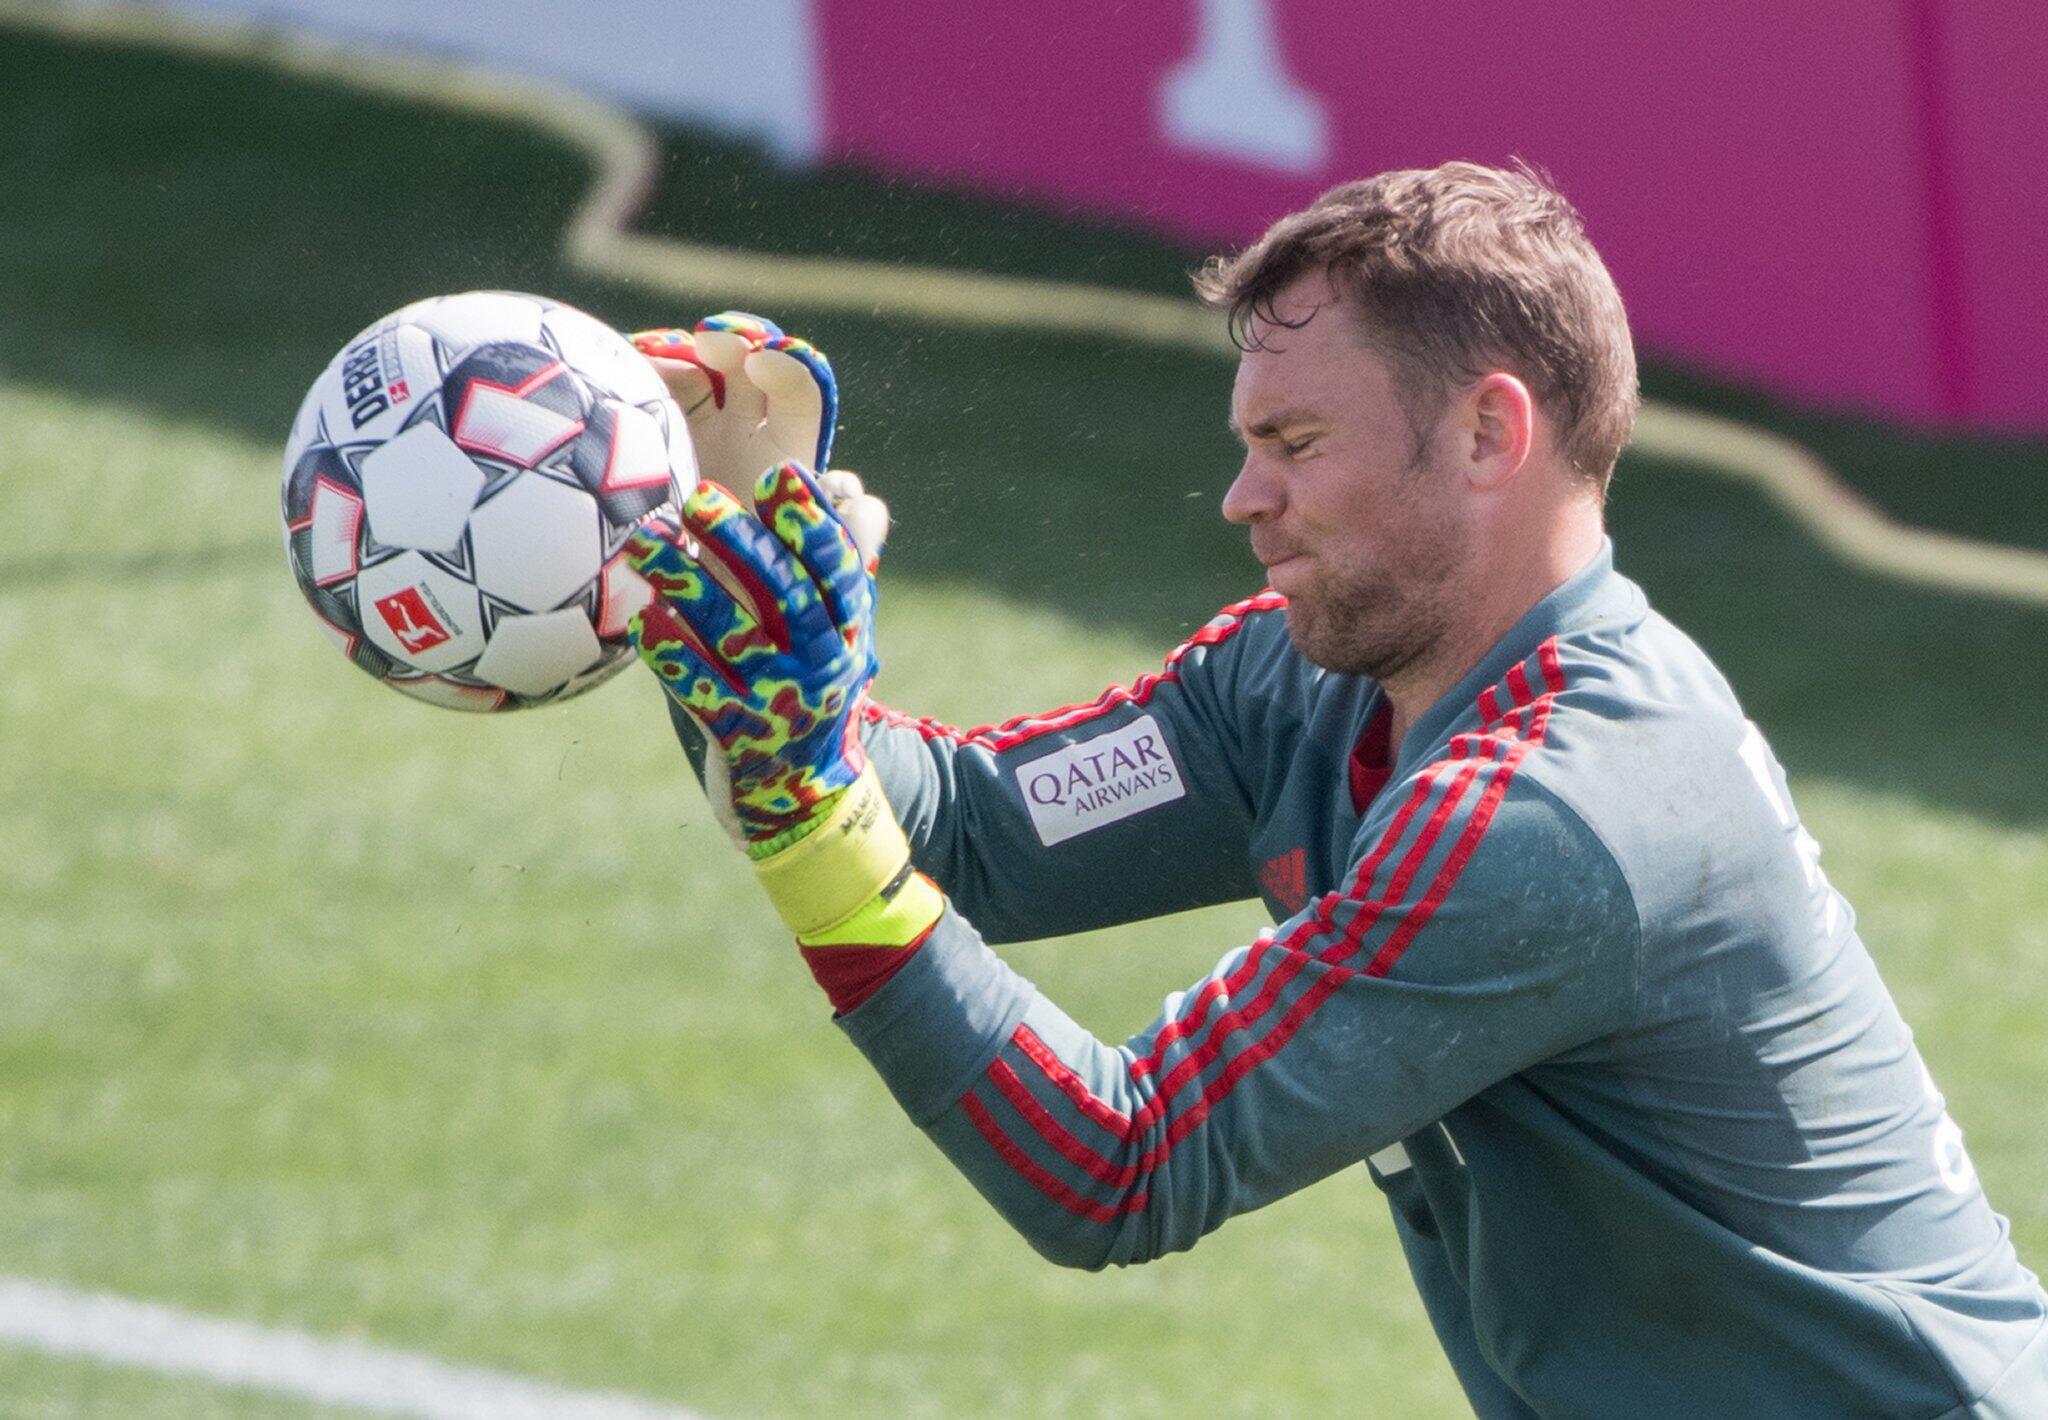 DFB-Pokal - FC Bayern rettet sich ins Viertelfinale